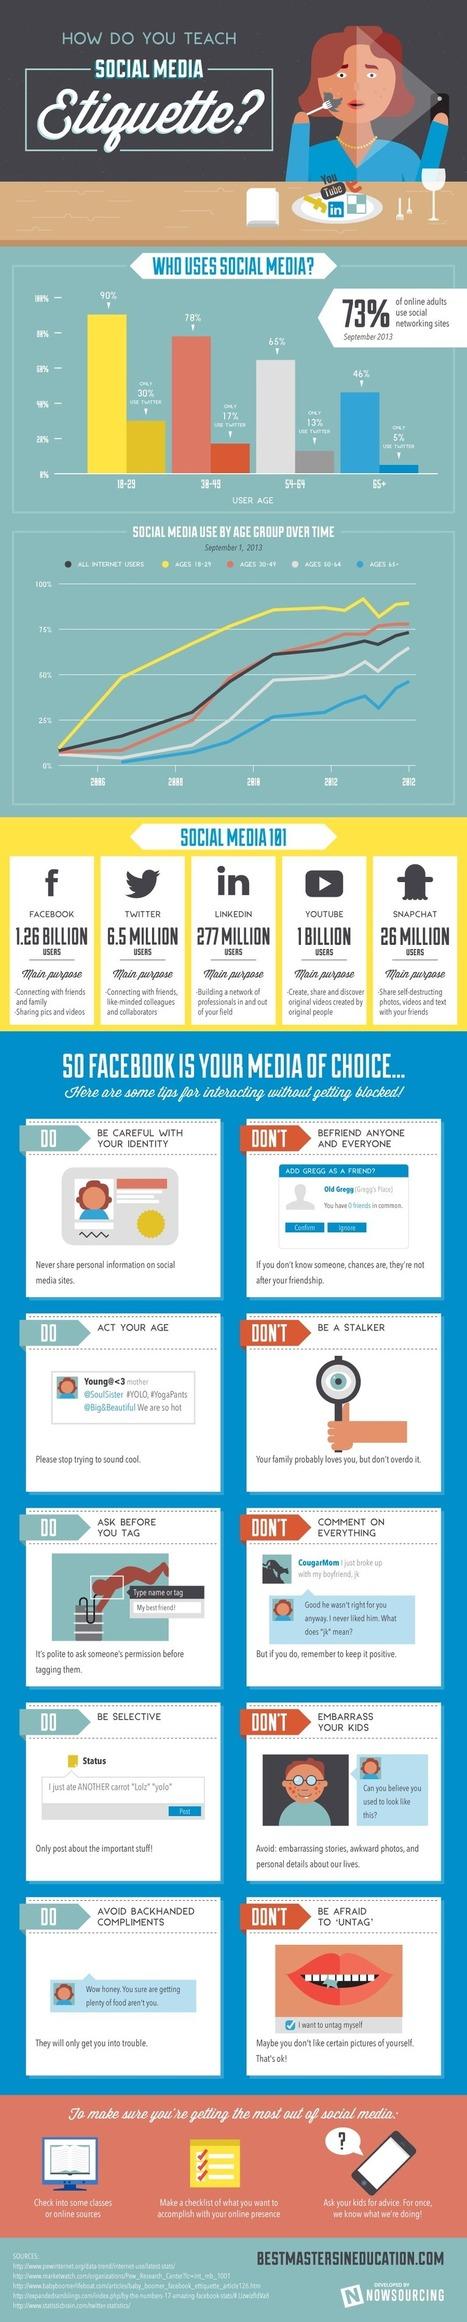 Social Media Etiquette [Infographic]   Digital-News on Scoop.it today   Scoop.it